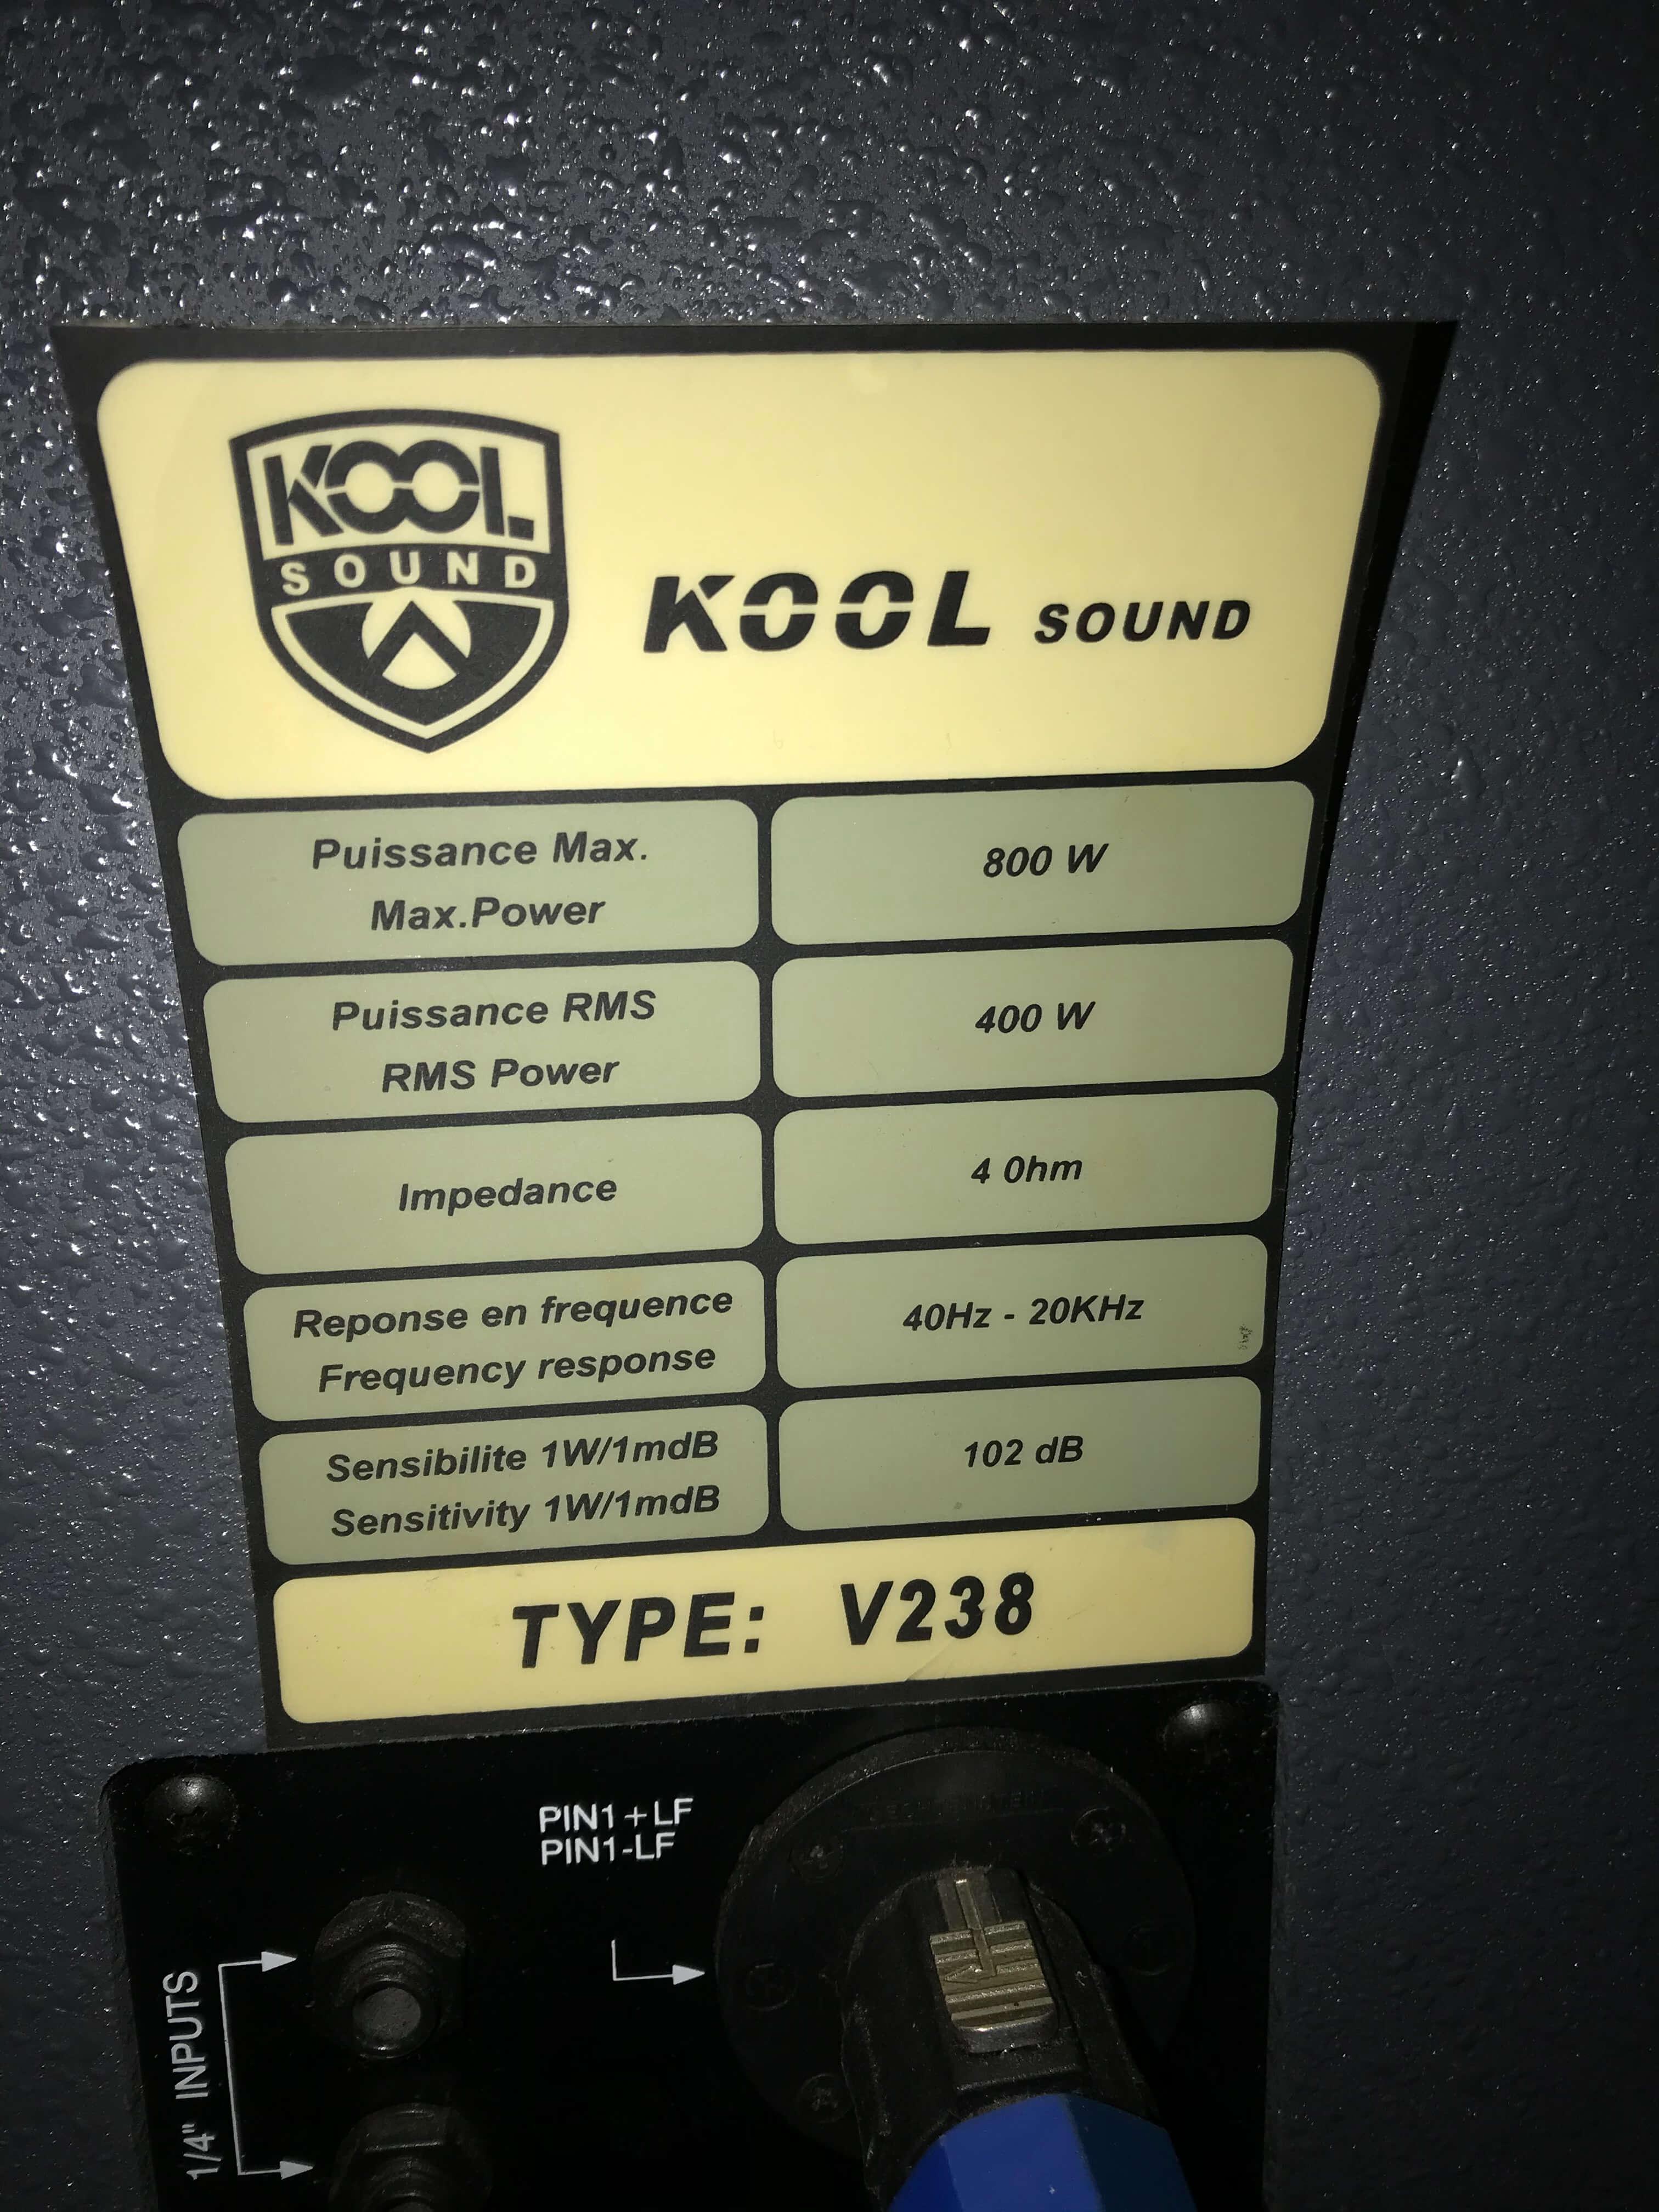 koolsound etiquette